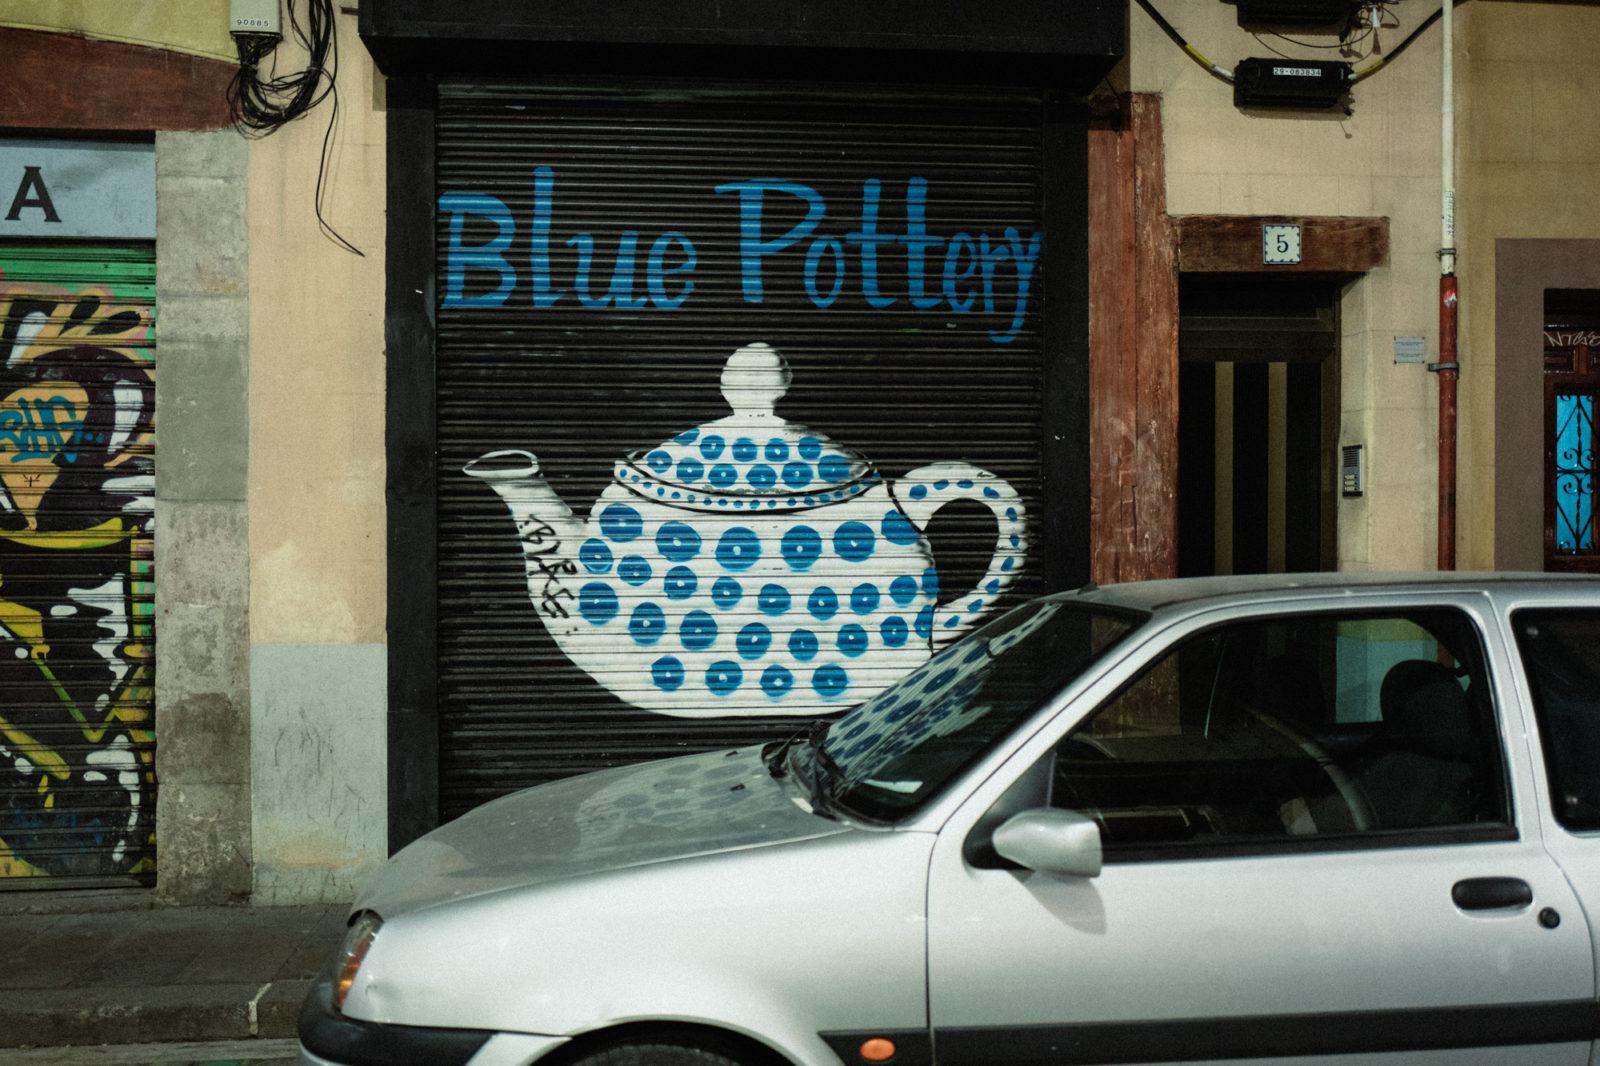 Barcelona Street-1090696